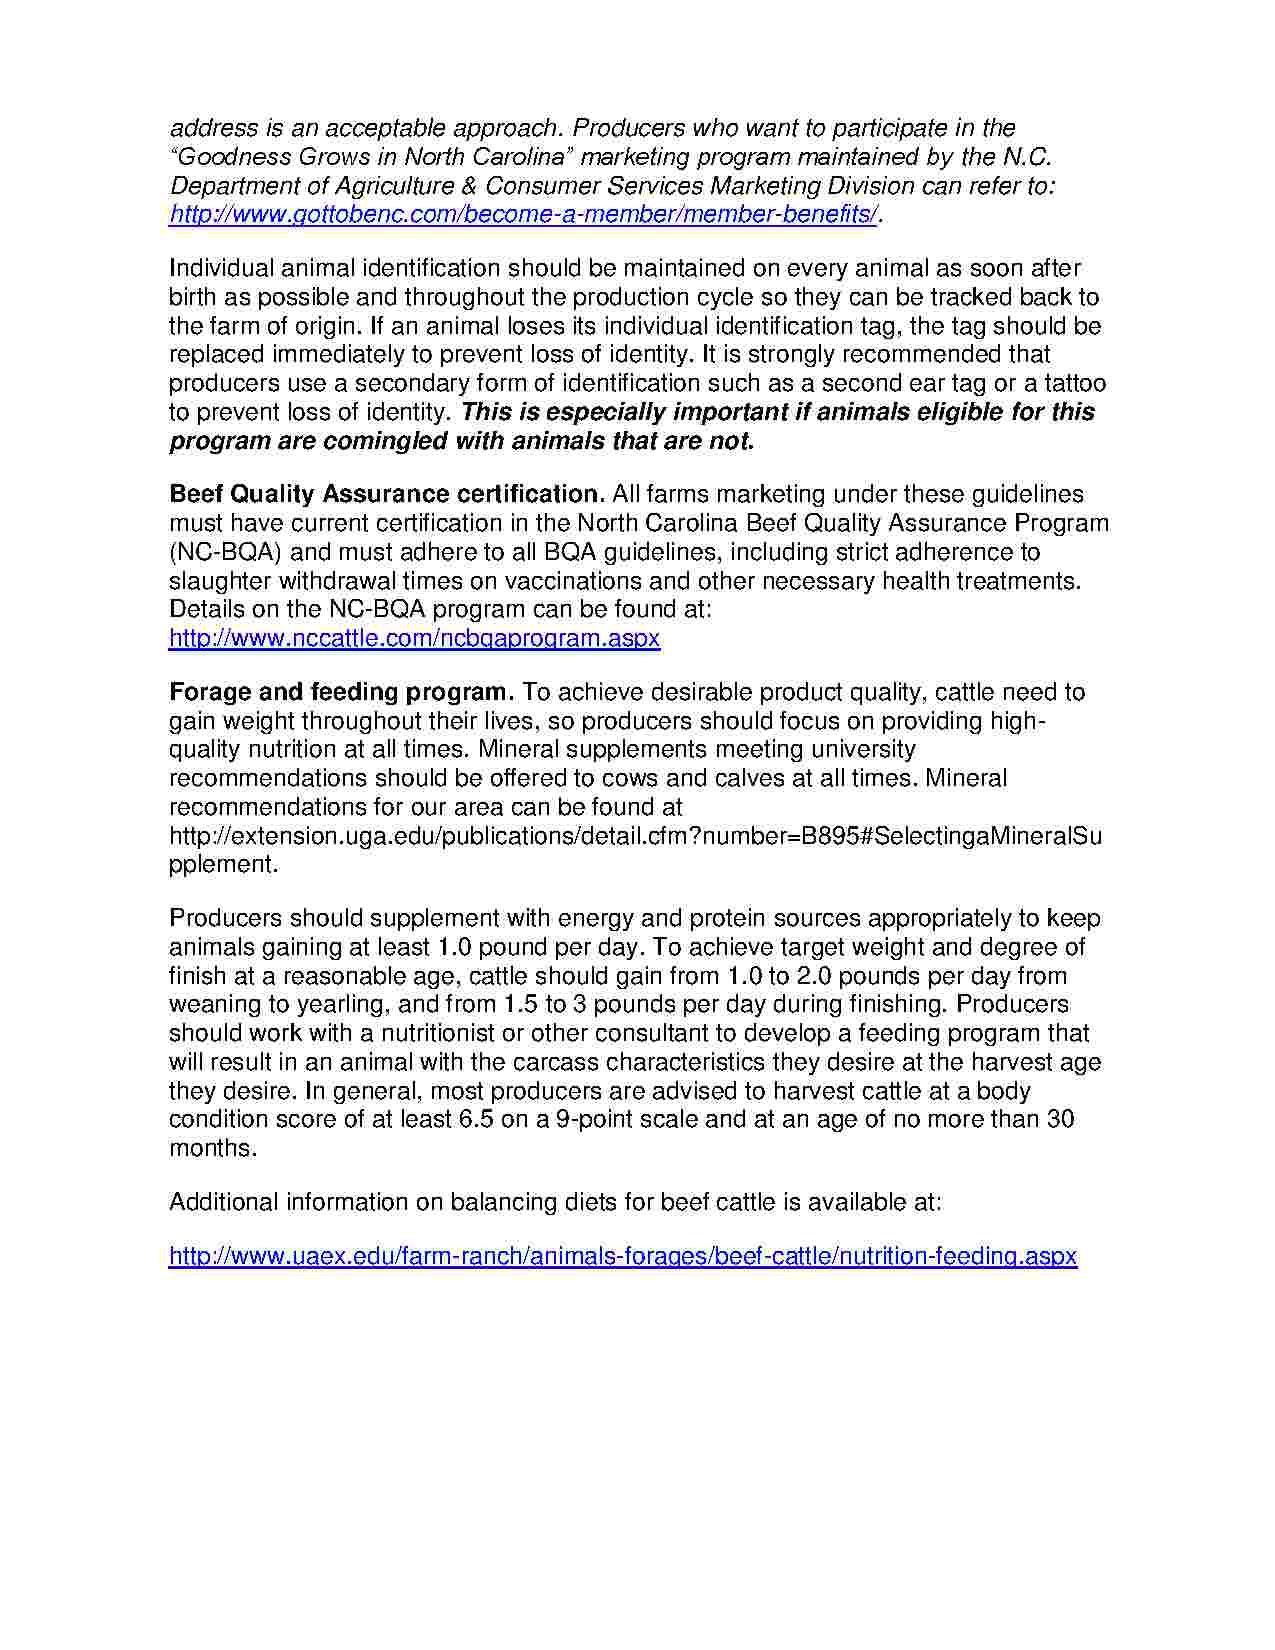 Templates Affidavit Of Identity Templates Hunter Affidavit Of